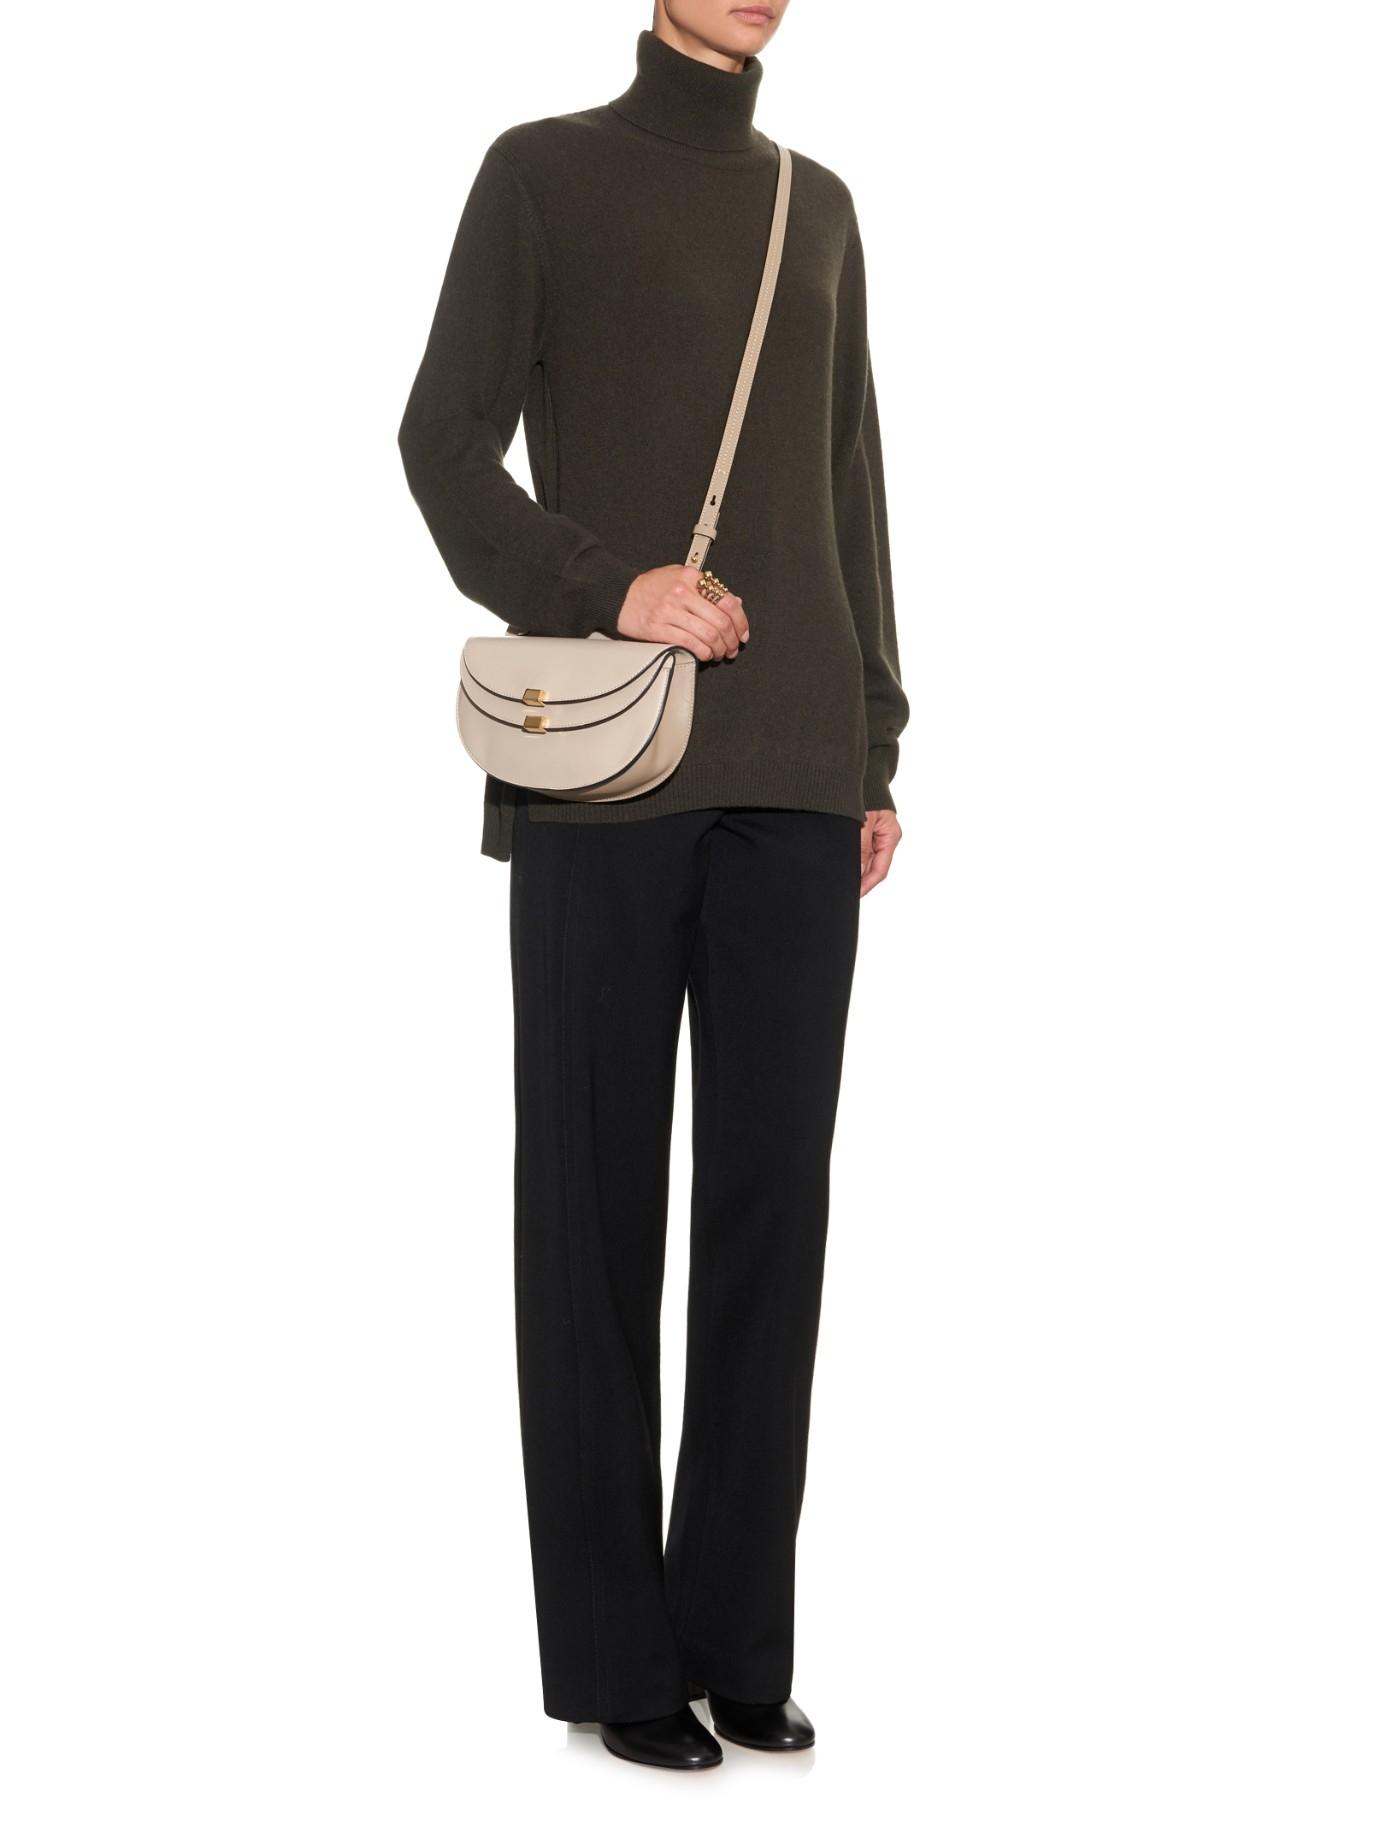 Chlo¨¦ Georgia Mini Leather Cross-Body Bag in Beige (GREY) | Lyst